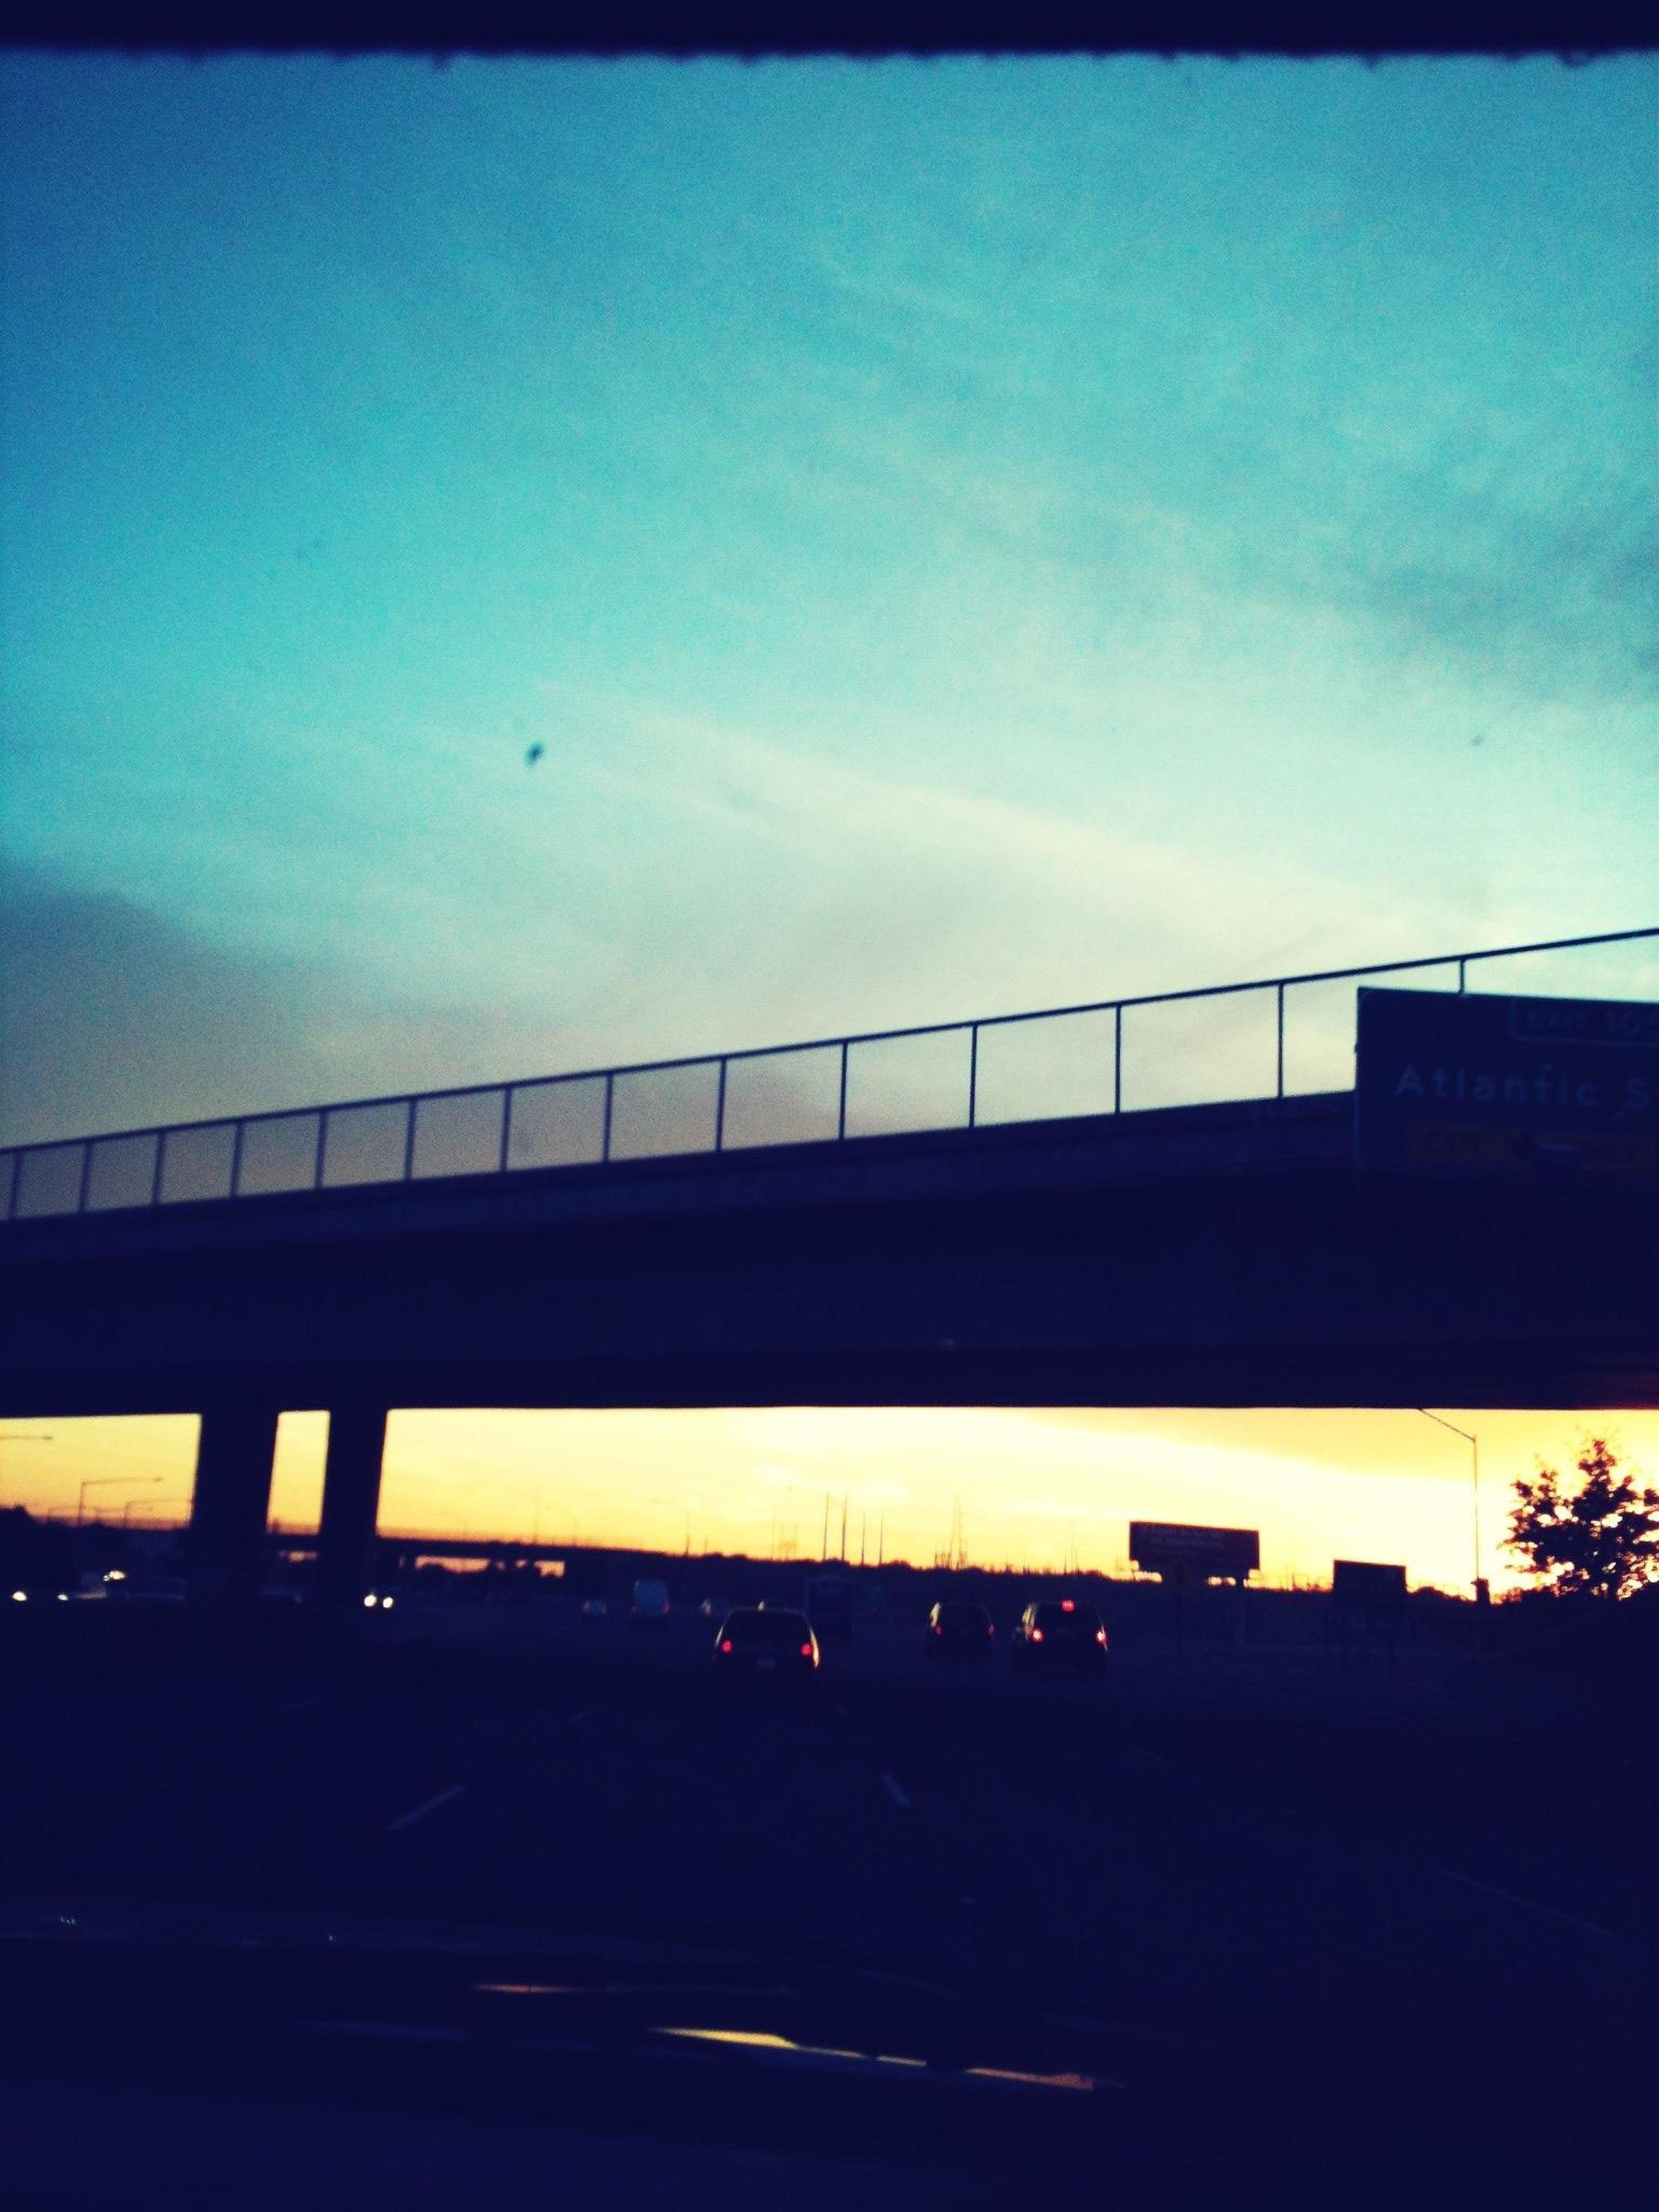 architecture, built structure, bridge - man made structure, sky, connection, low angle view, transportation, silhouette, bridge, engineering, dusk, sunset, building exterior, illuminated, cloud - sky, blue, city, no people, cloud, railing